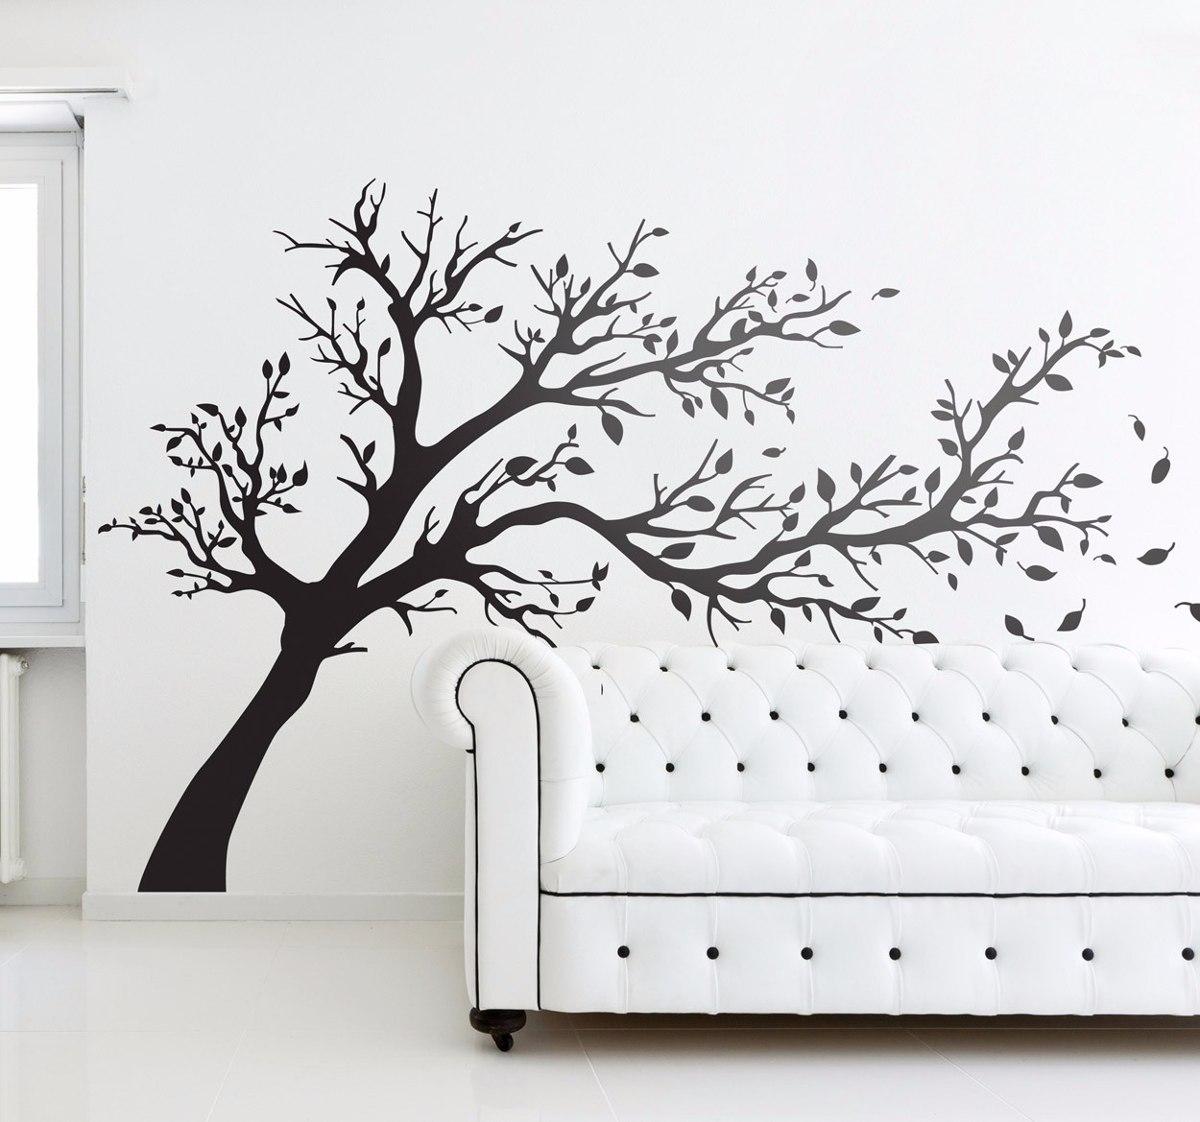 Vinilo decorativo pared arbol torcido 115x180cm jota - Arboles decorativos ...